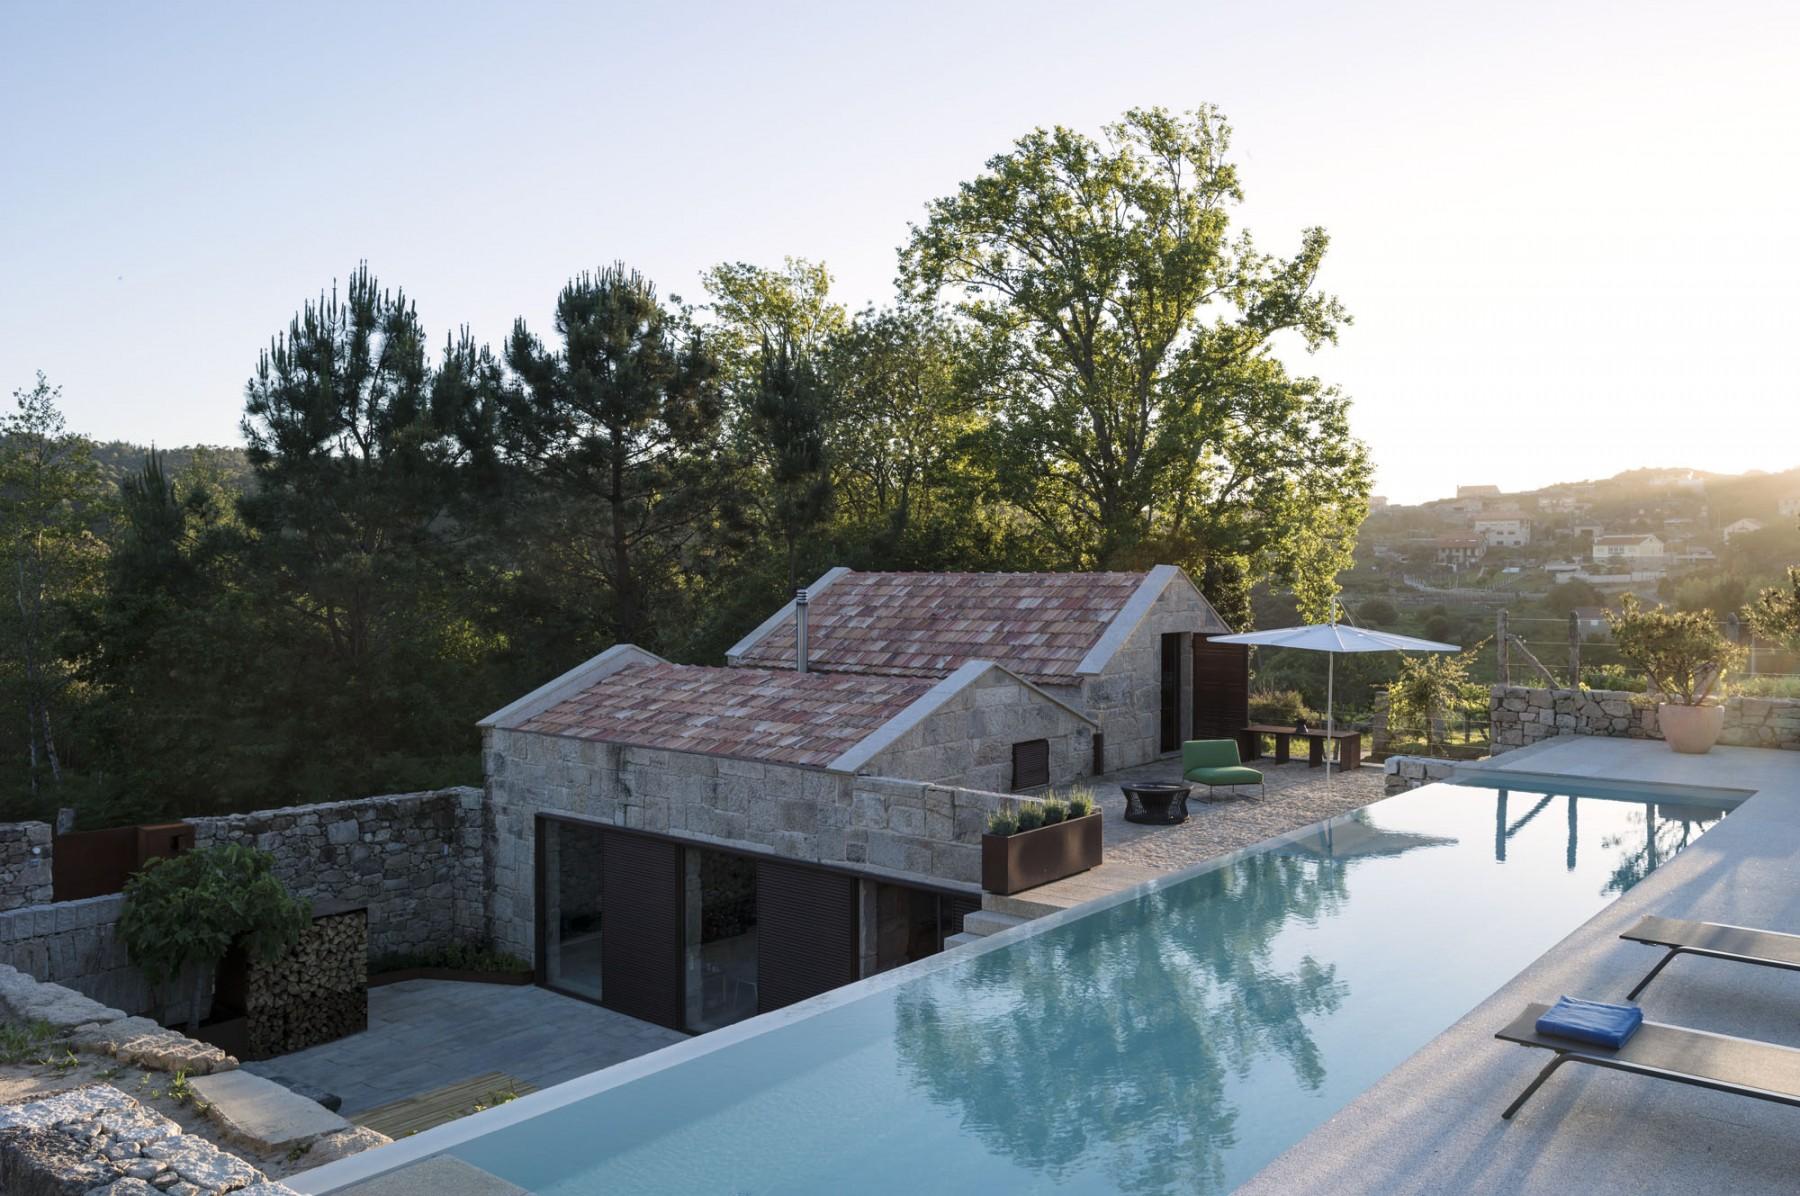 jamie-fobert-architects-camino-de-playa-galicia-Ciro-frank-schiappa2